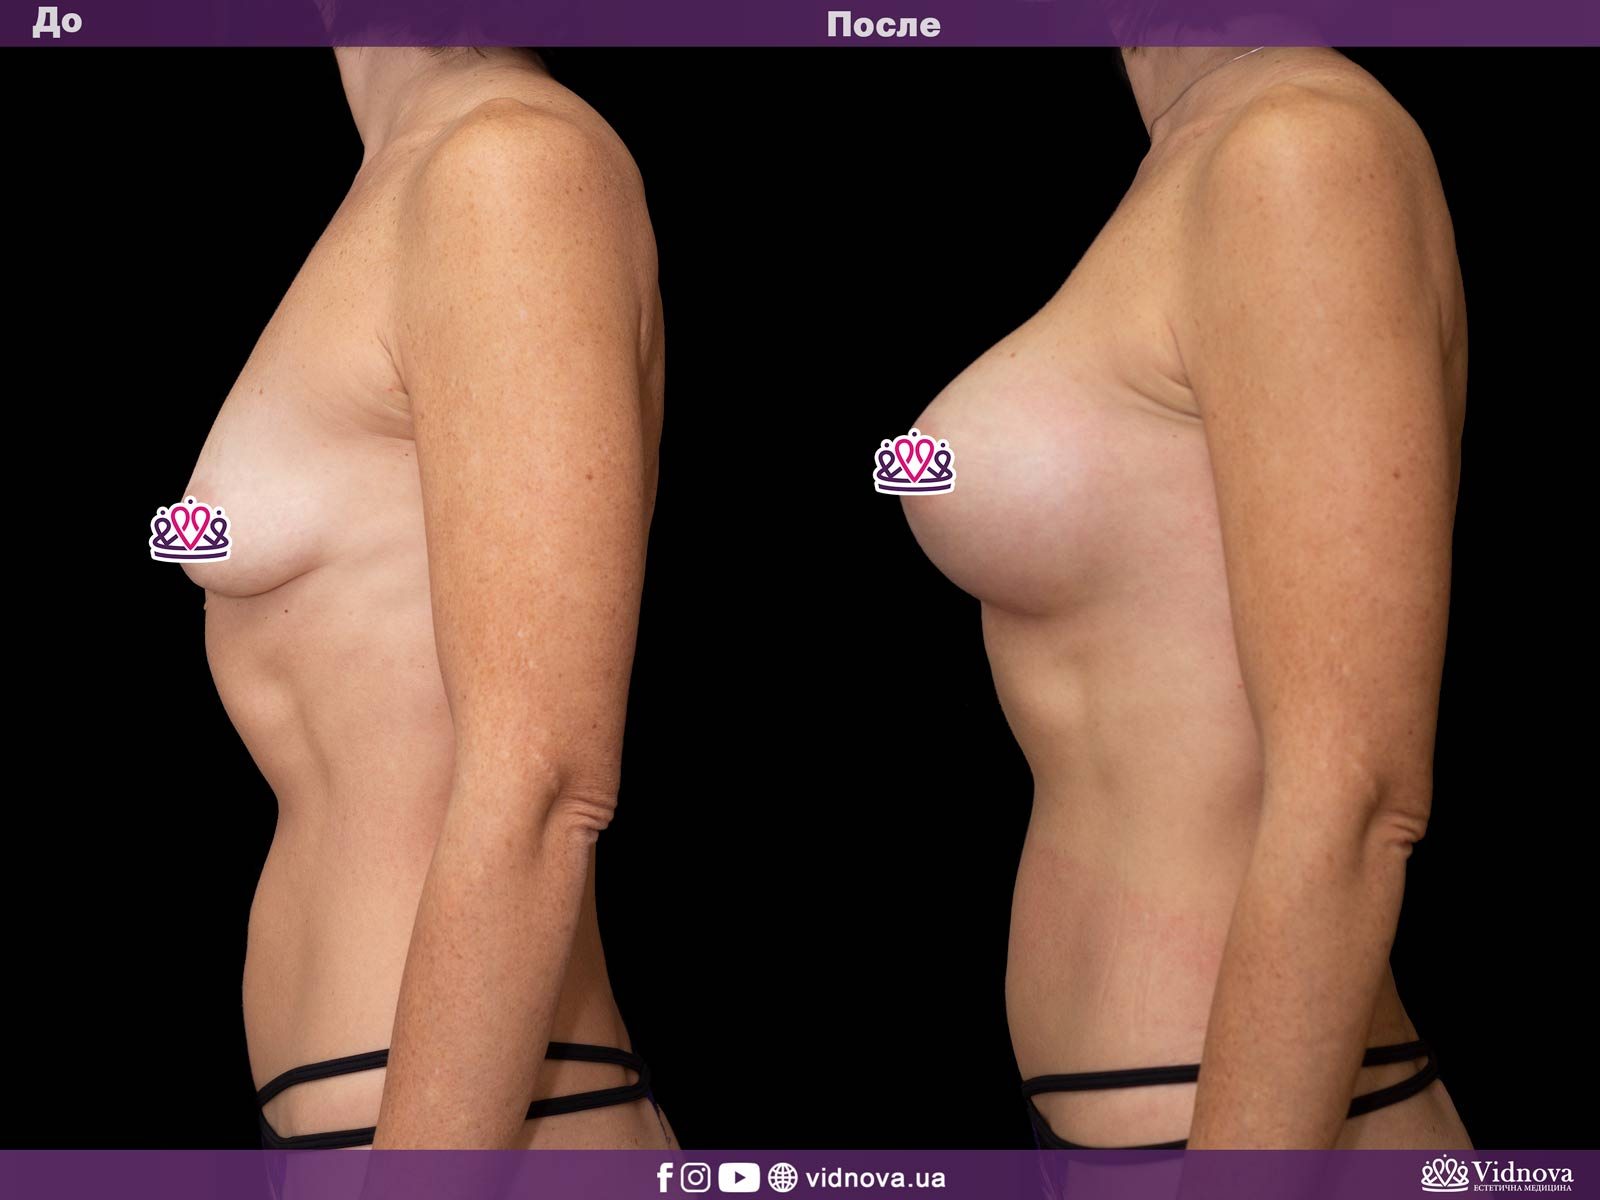 Увеличение груди: Фото ДО и ПОСЛЕ - Пример №38-3 - Клиника Vidnova